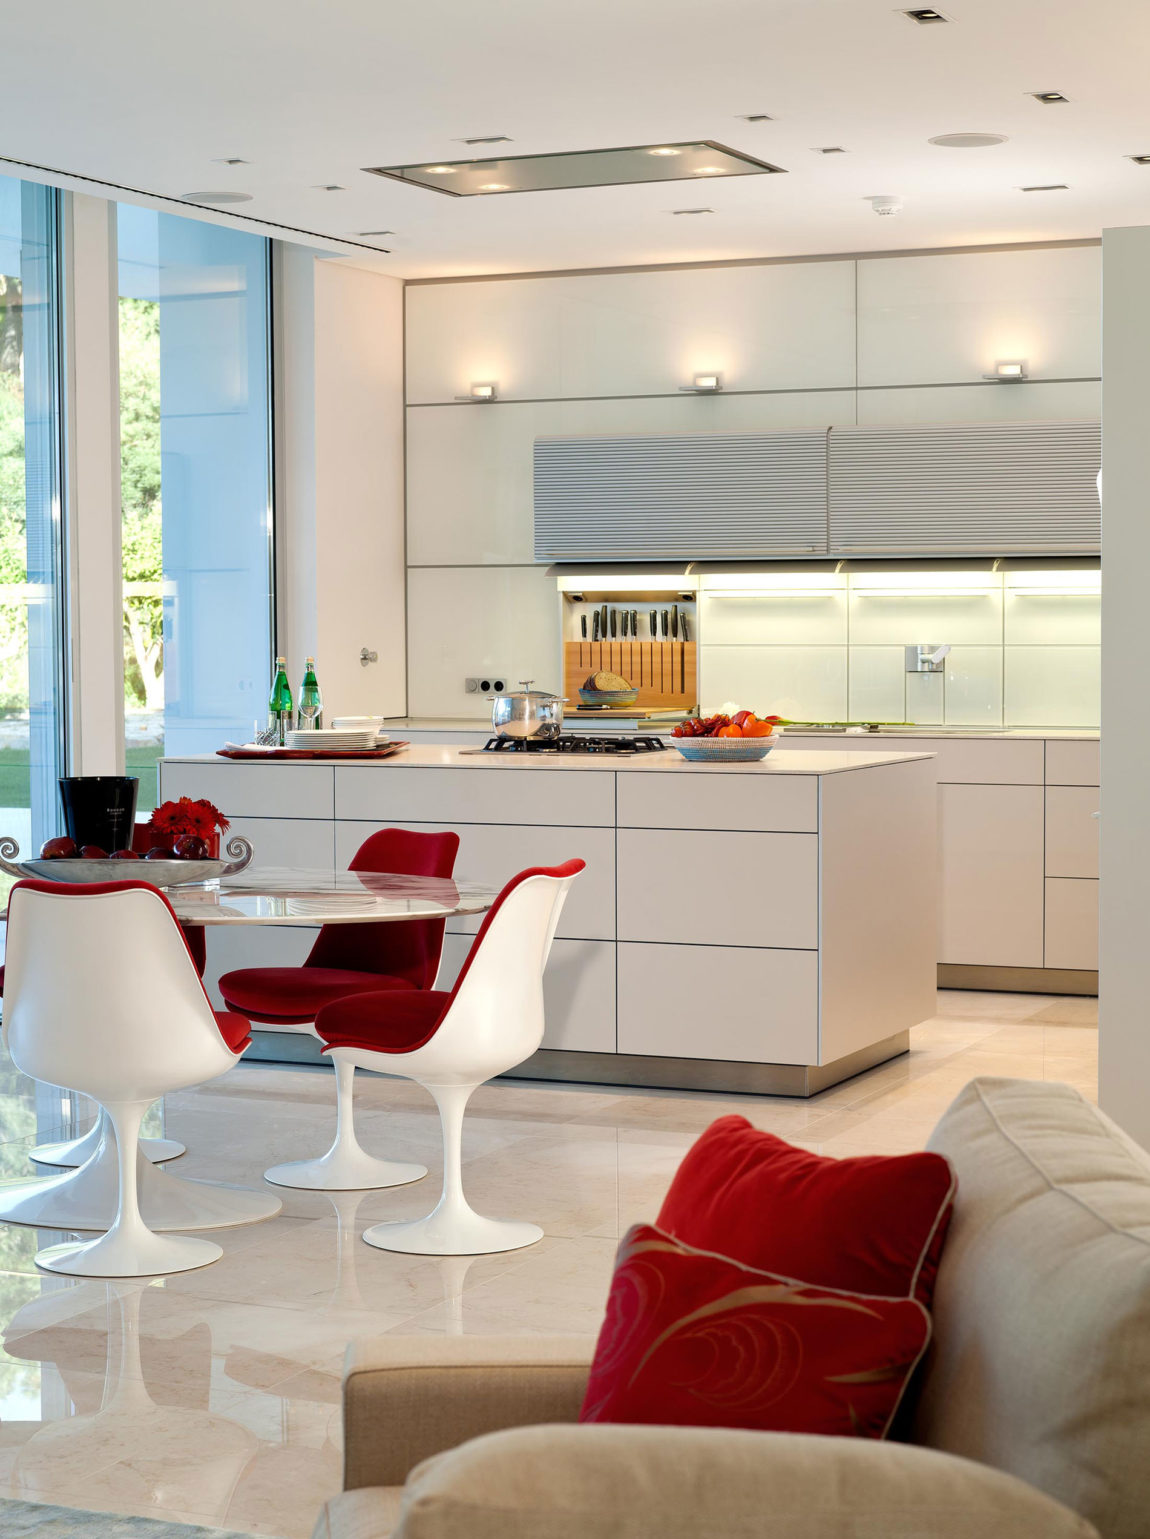 Quinta Villa by Staffan Tollgard Design Group (7)